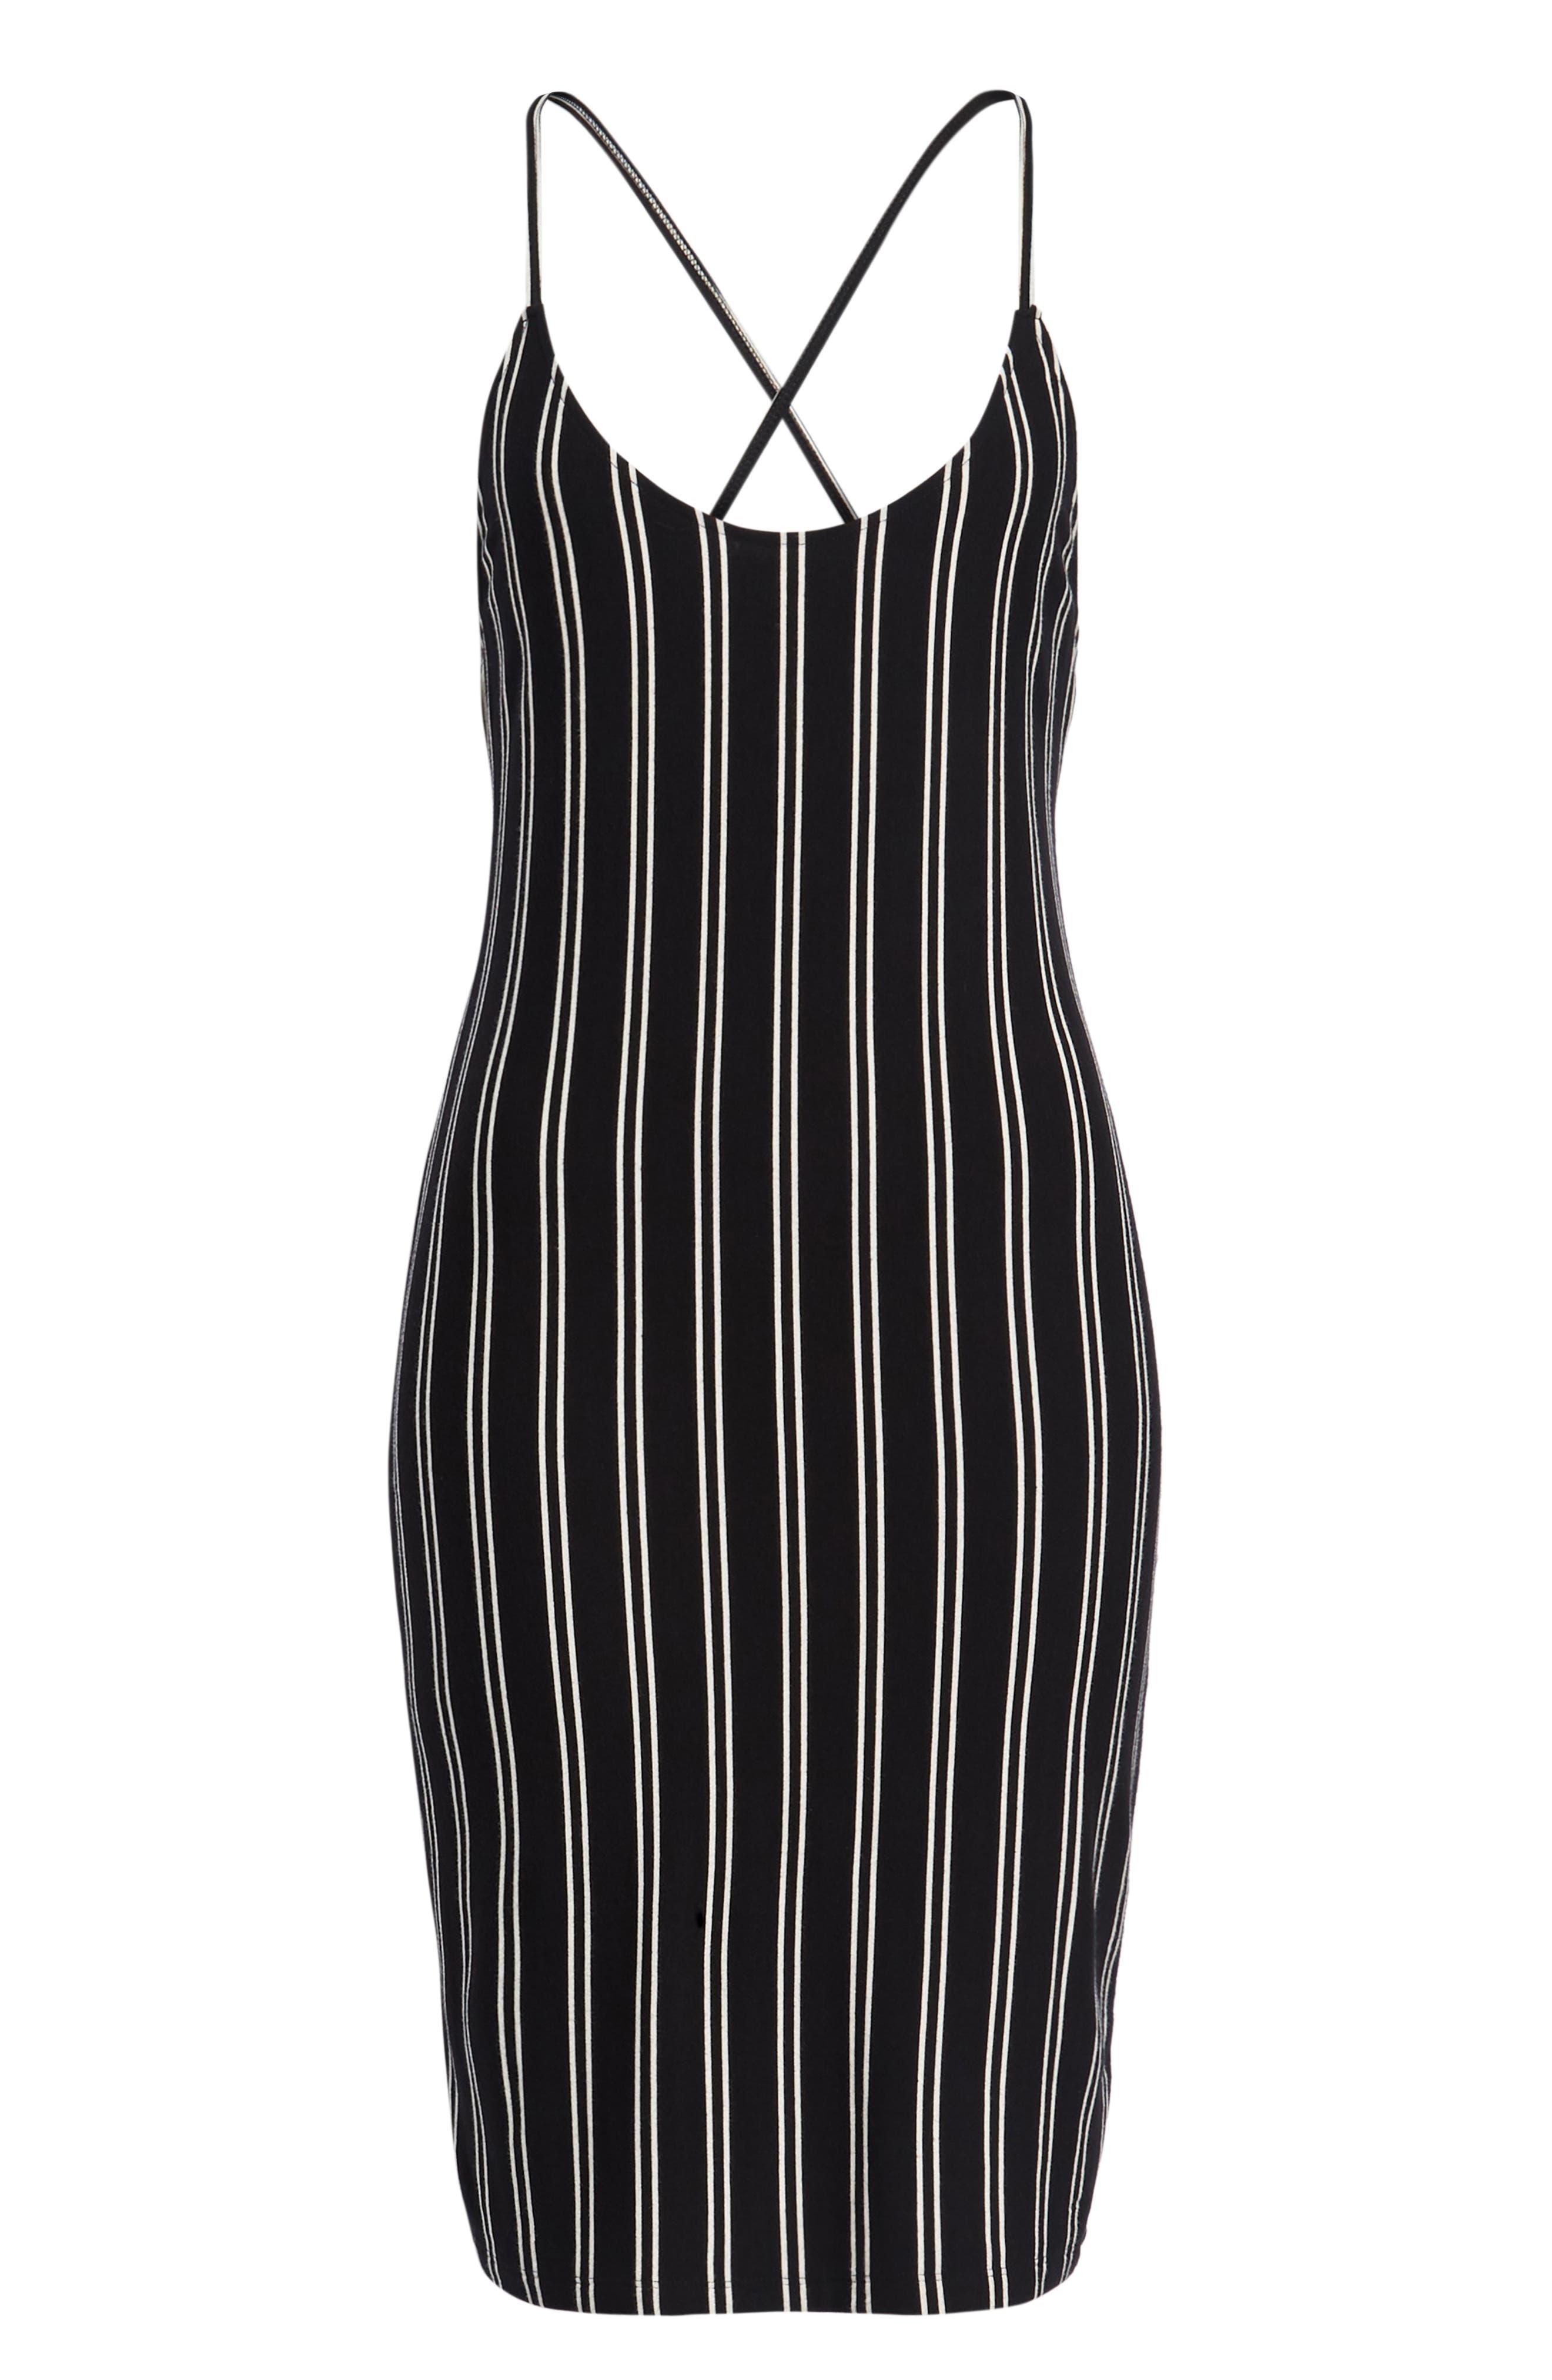 Lockette Strappy Striped Dress,                             Alternate thumbnail 7, color,                             005